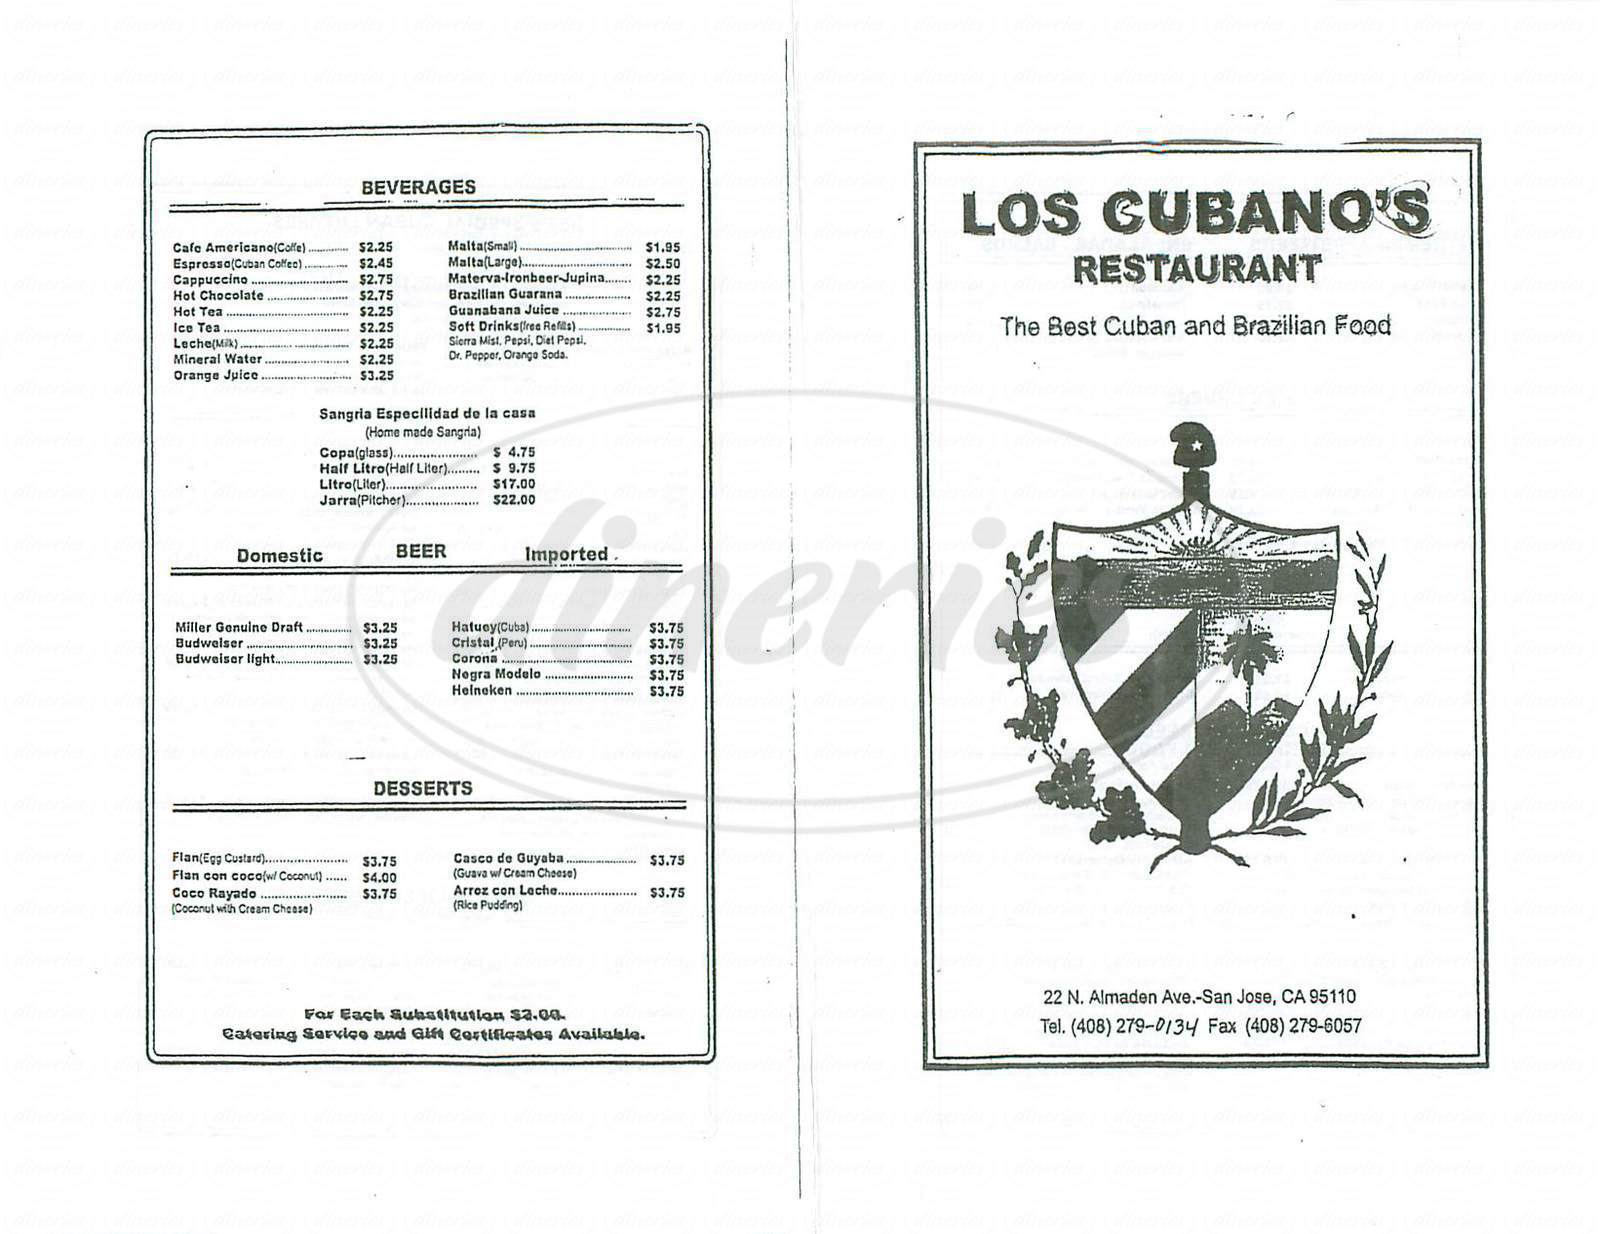 menu for Los Cubanos Restaurant